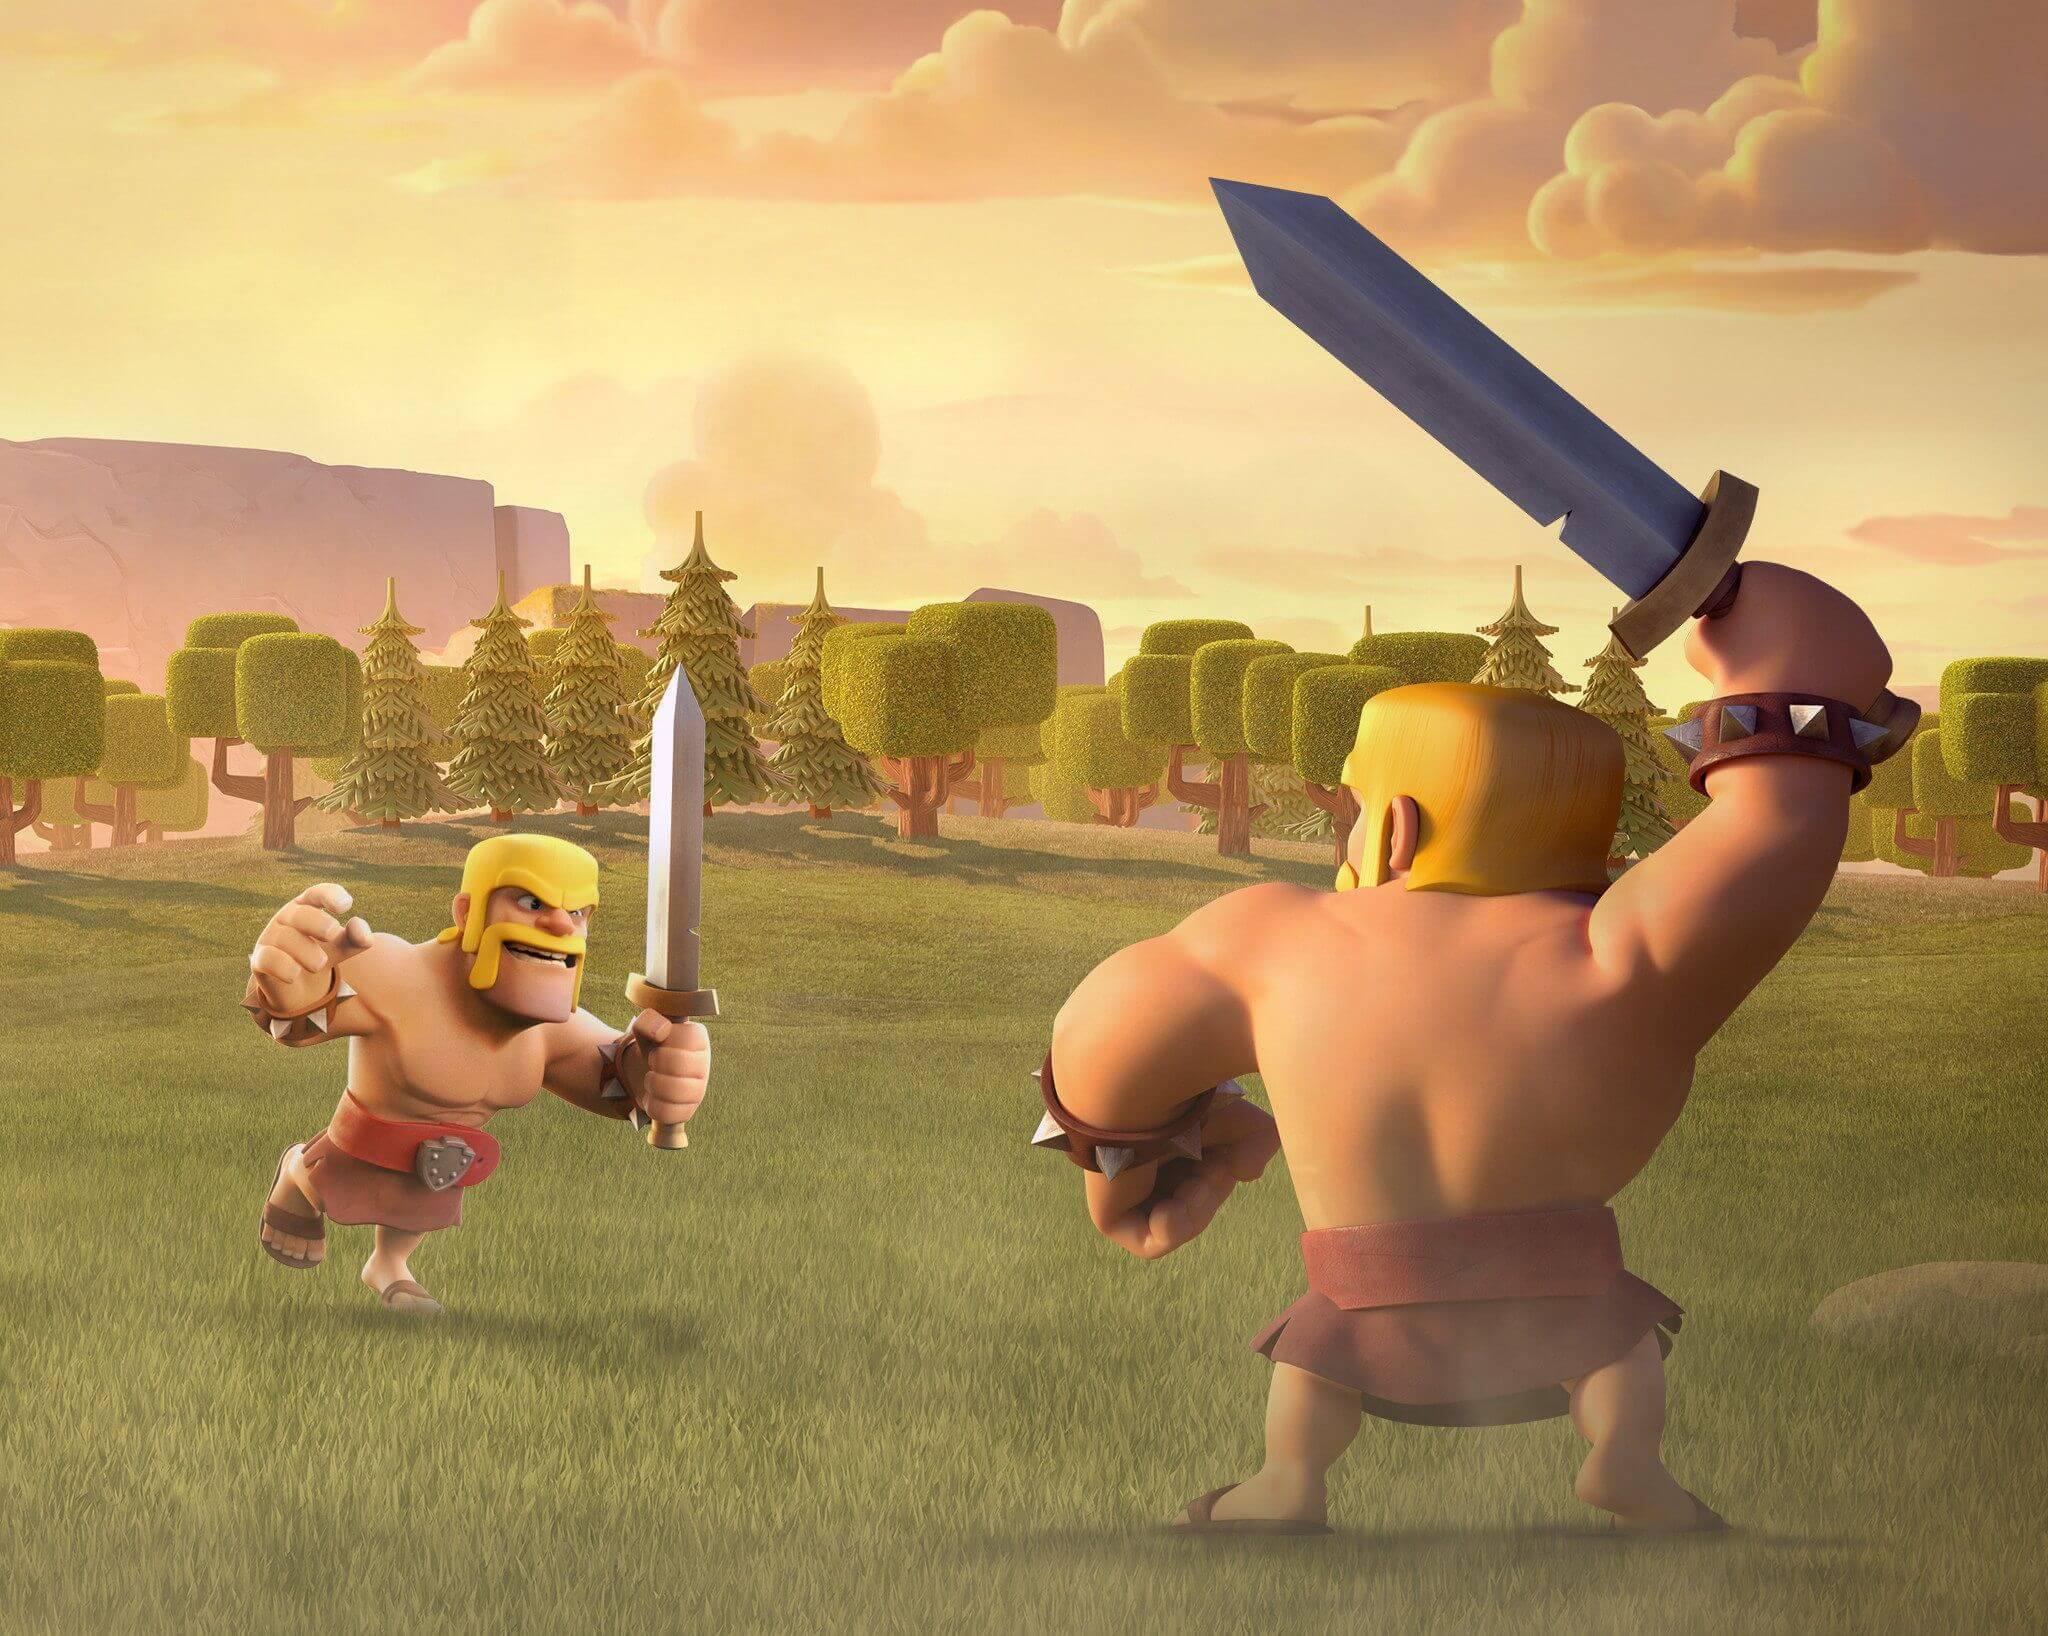 Clash of Clans Barbarian vs. Barbarian Wallpaper